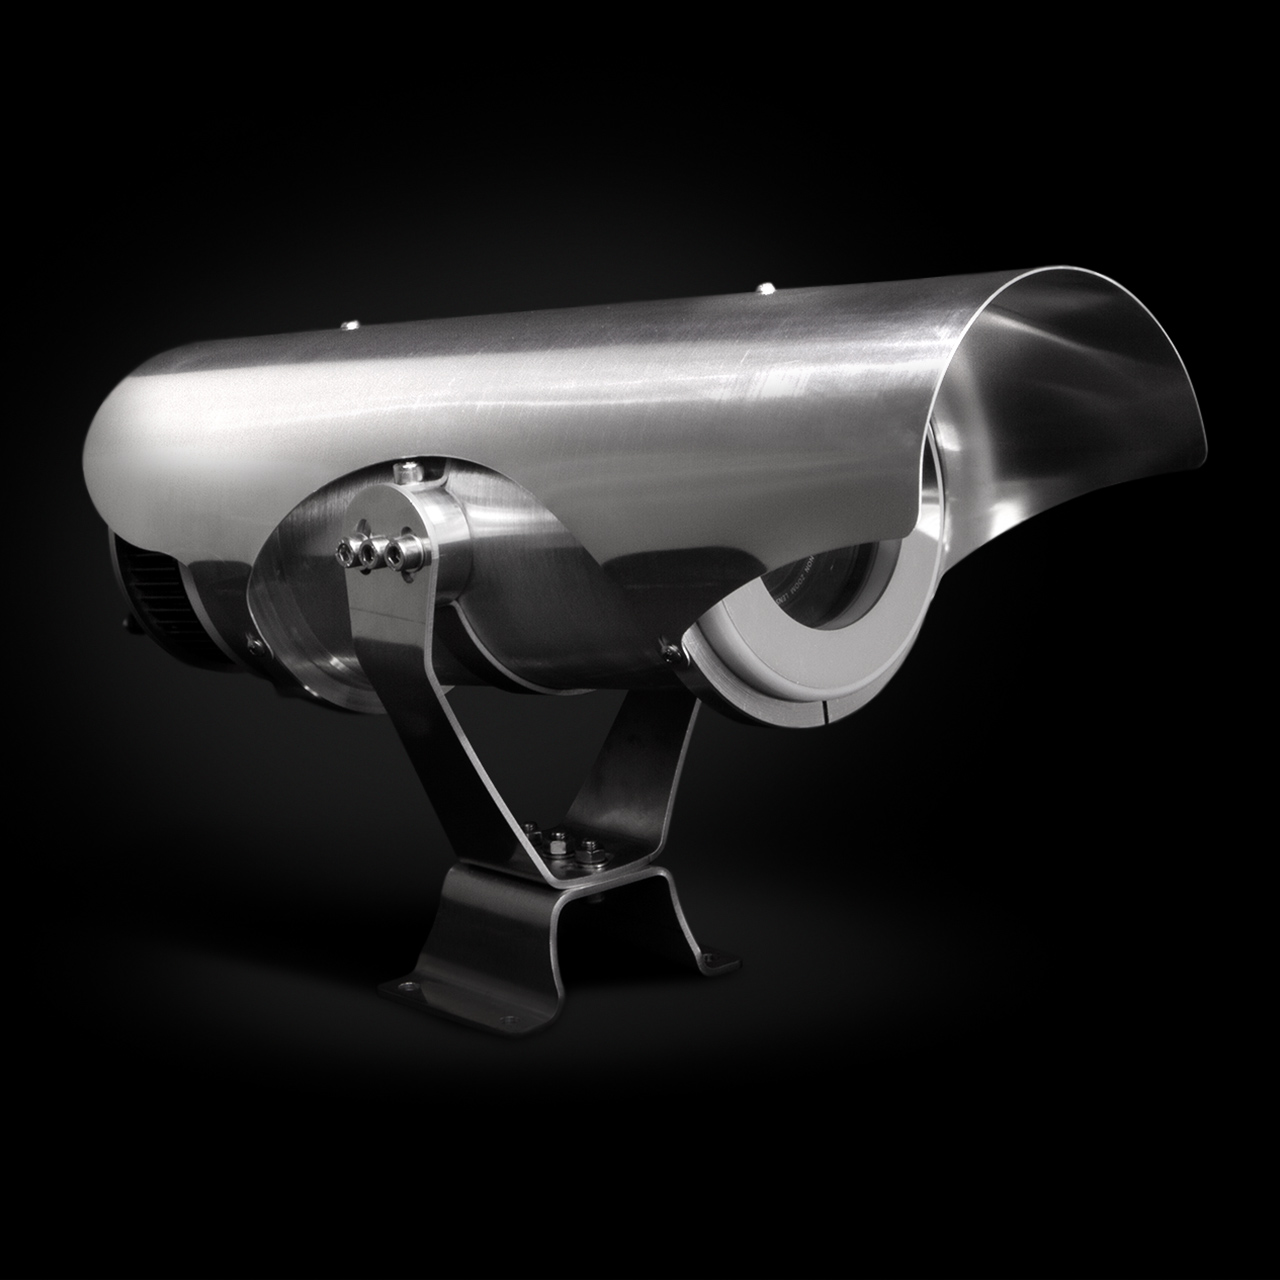 OFF-Ride camera